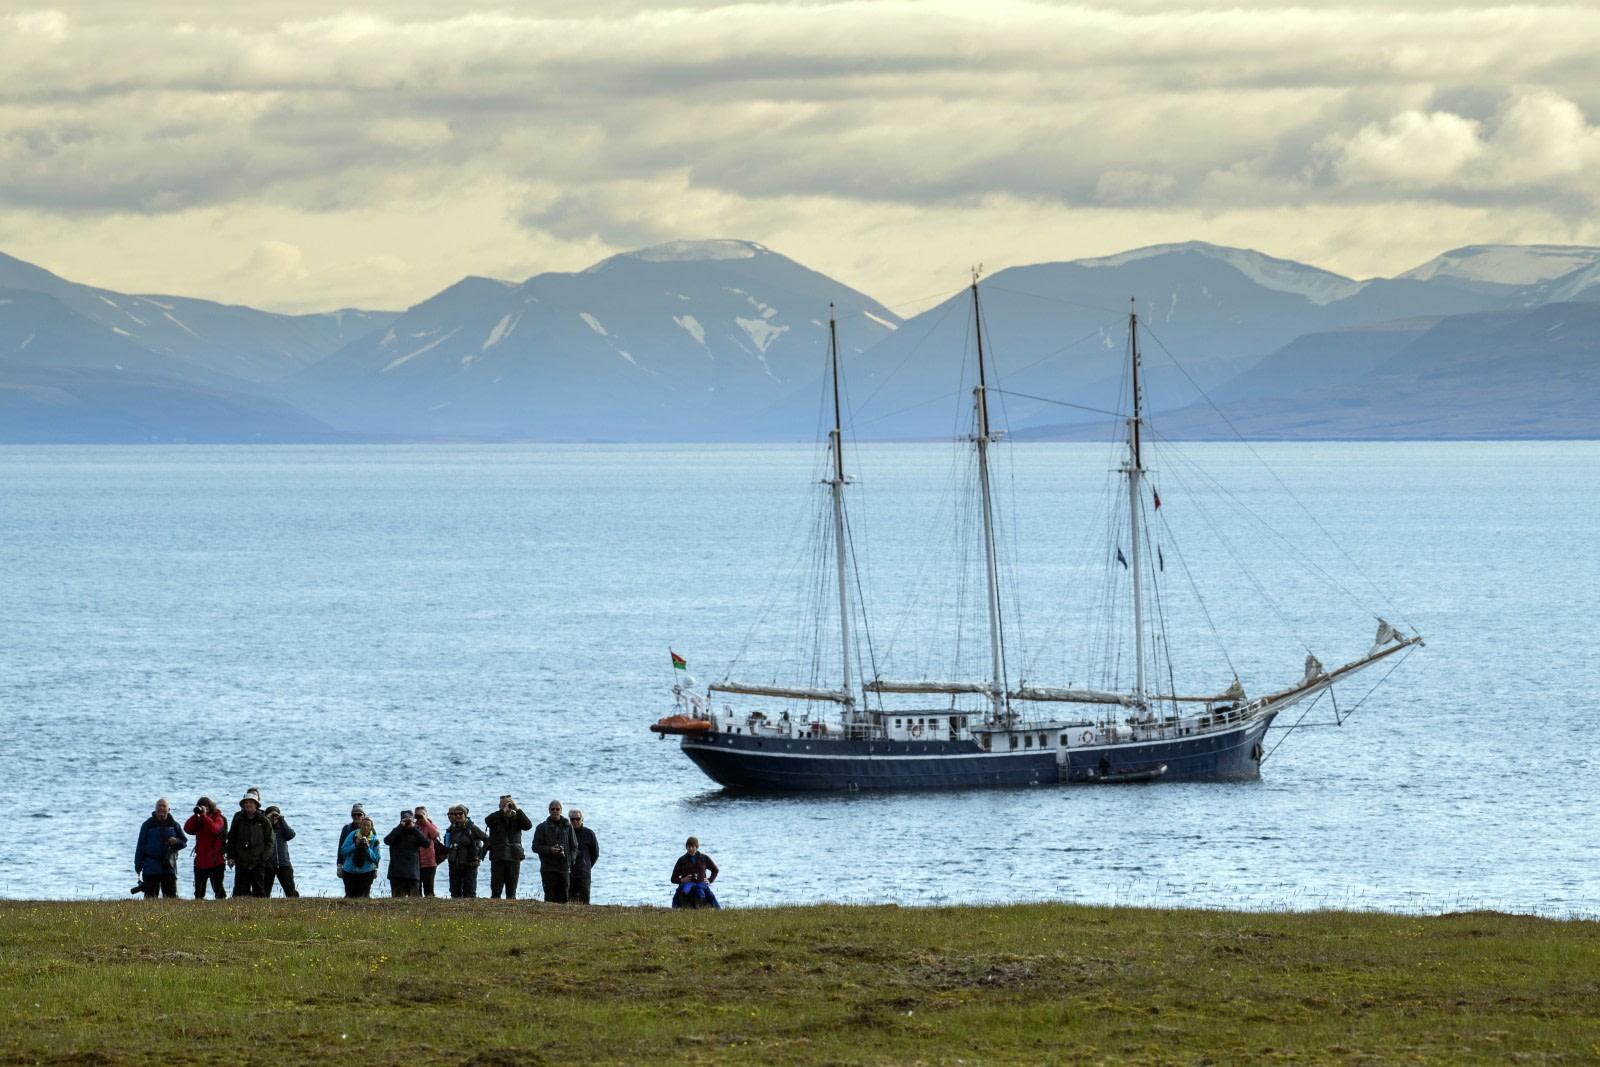 August; Rembrandt van Rijn; sailing ship; landscape; Tall Ship; Arctic; excursion; people in action; landing;.jpg